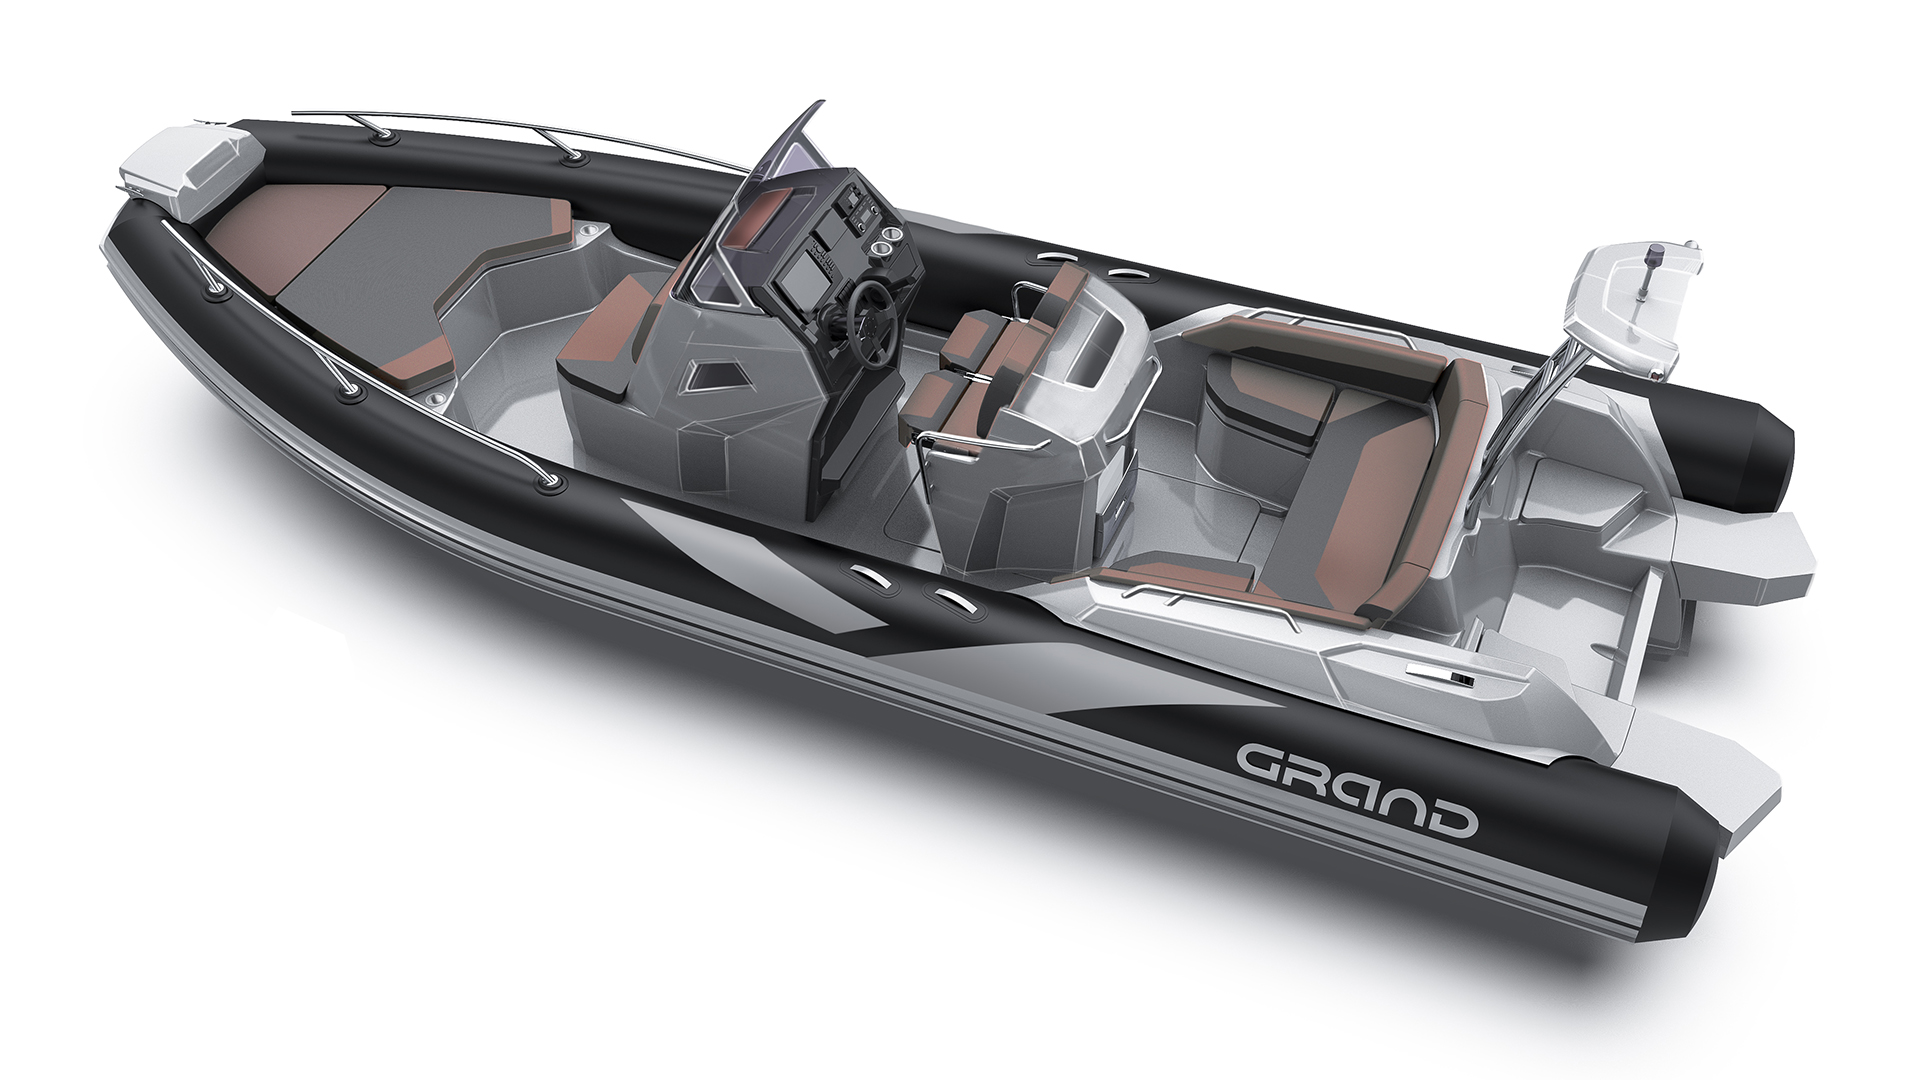 GRAND Golden Line G750, Golden Line G750, GRAND G750, G750, grand g750, GRAND Golden Line G750, надувная лодка с жестким дном, надувная лодка GRAND, надувная лодка ГРАНД